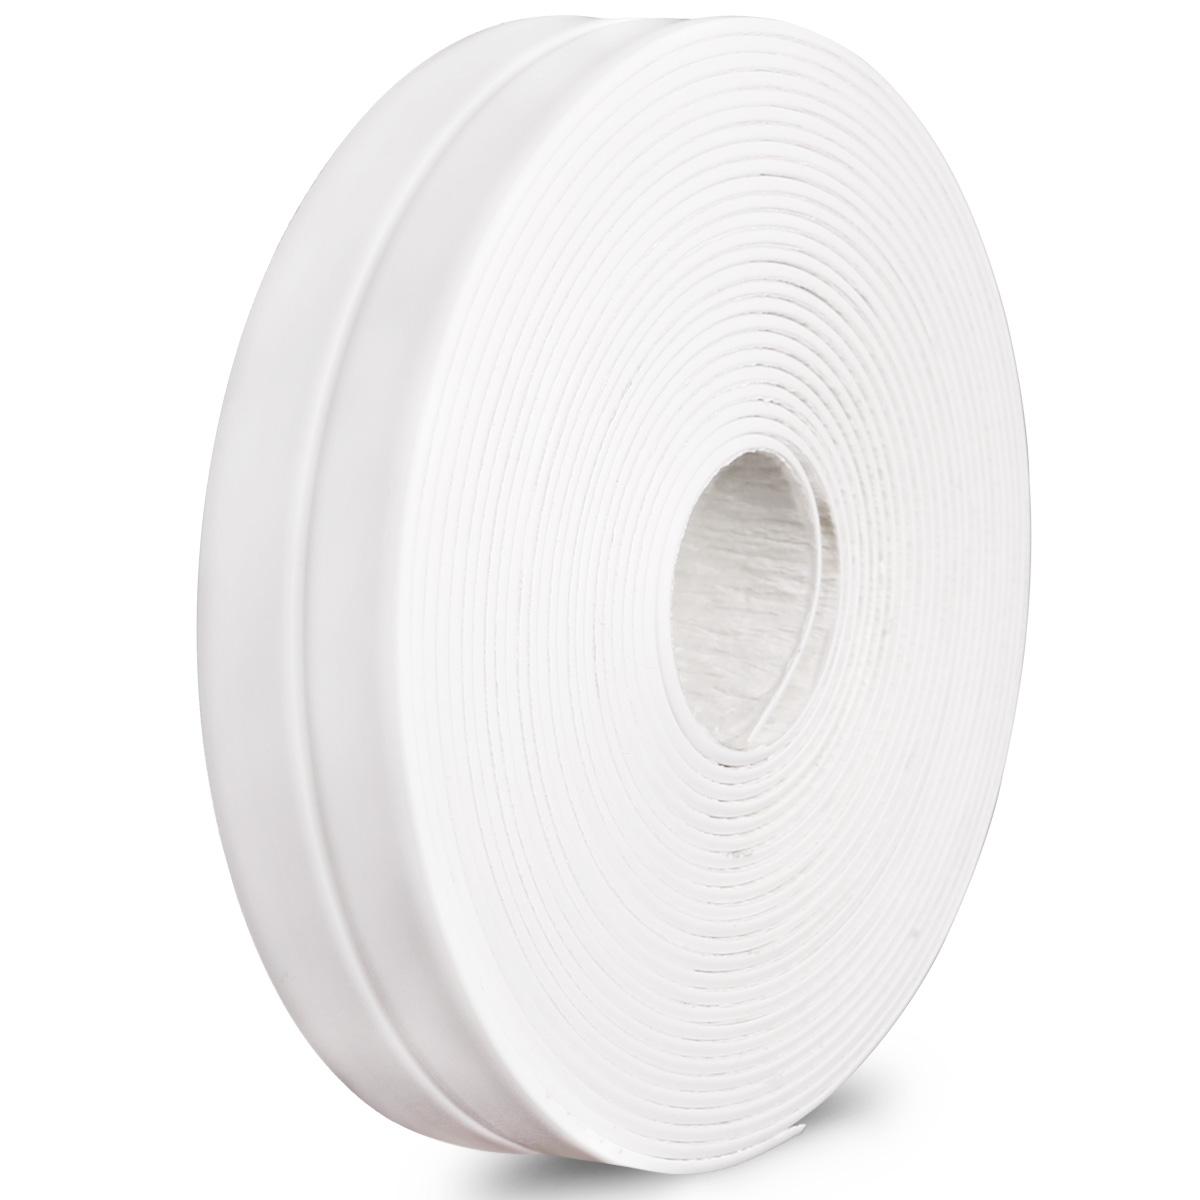 shower tray bath flexible waterproof seal strip 5 0. Black Bedroom Furniture Sets. Home Design Ideas